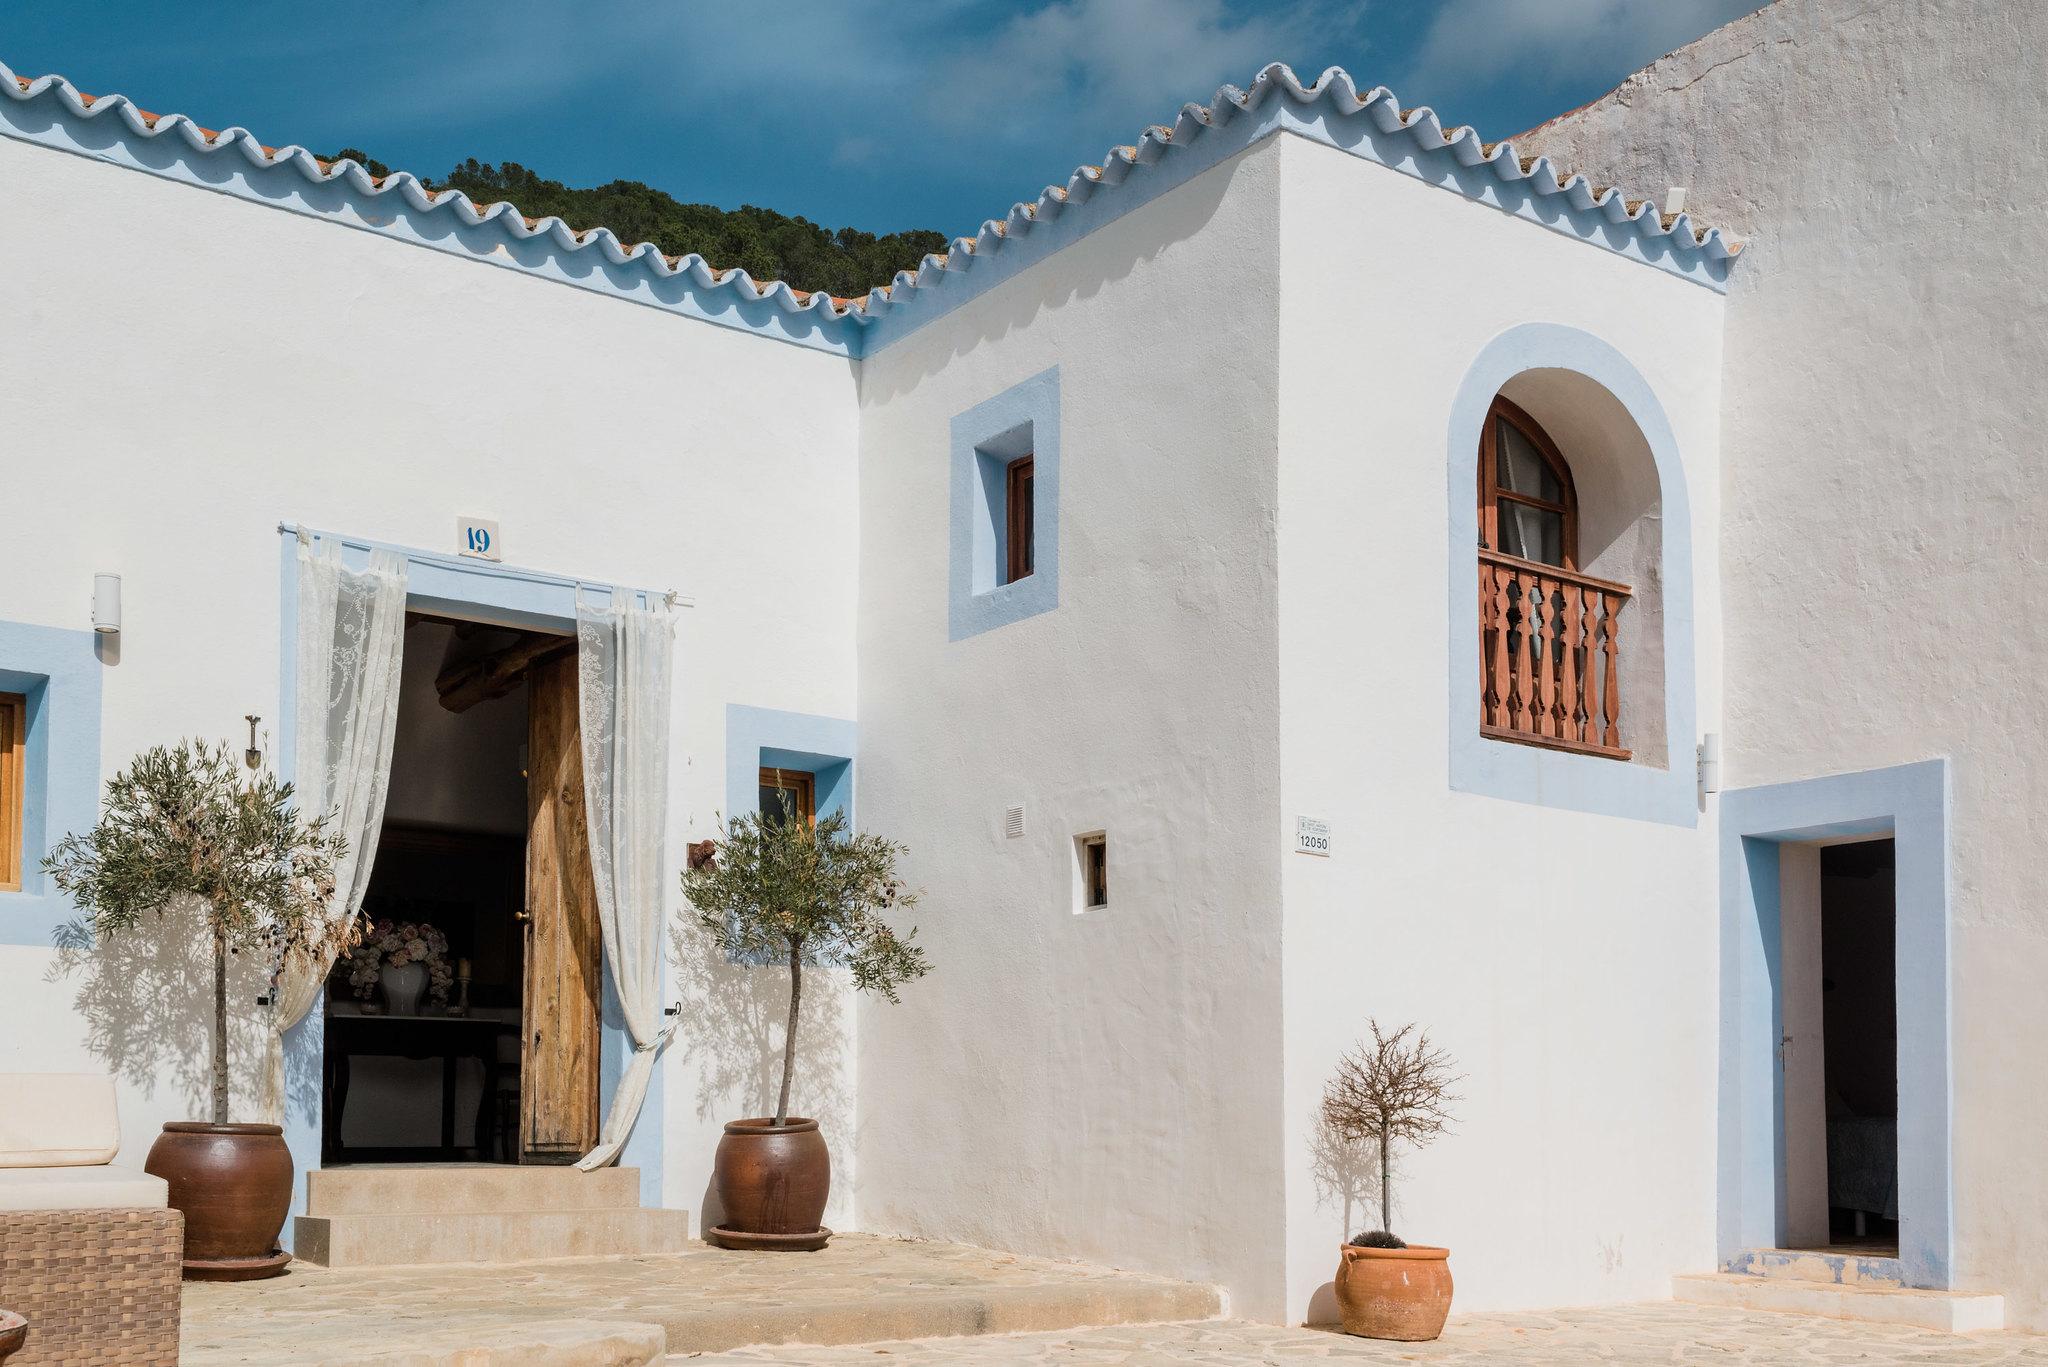 https://www.white-ibiza.com/wp-content/uploads/2020/06/white-ibiza-villas-los-corrales-exterior-blue-facade.jpg